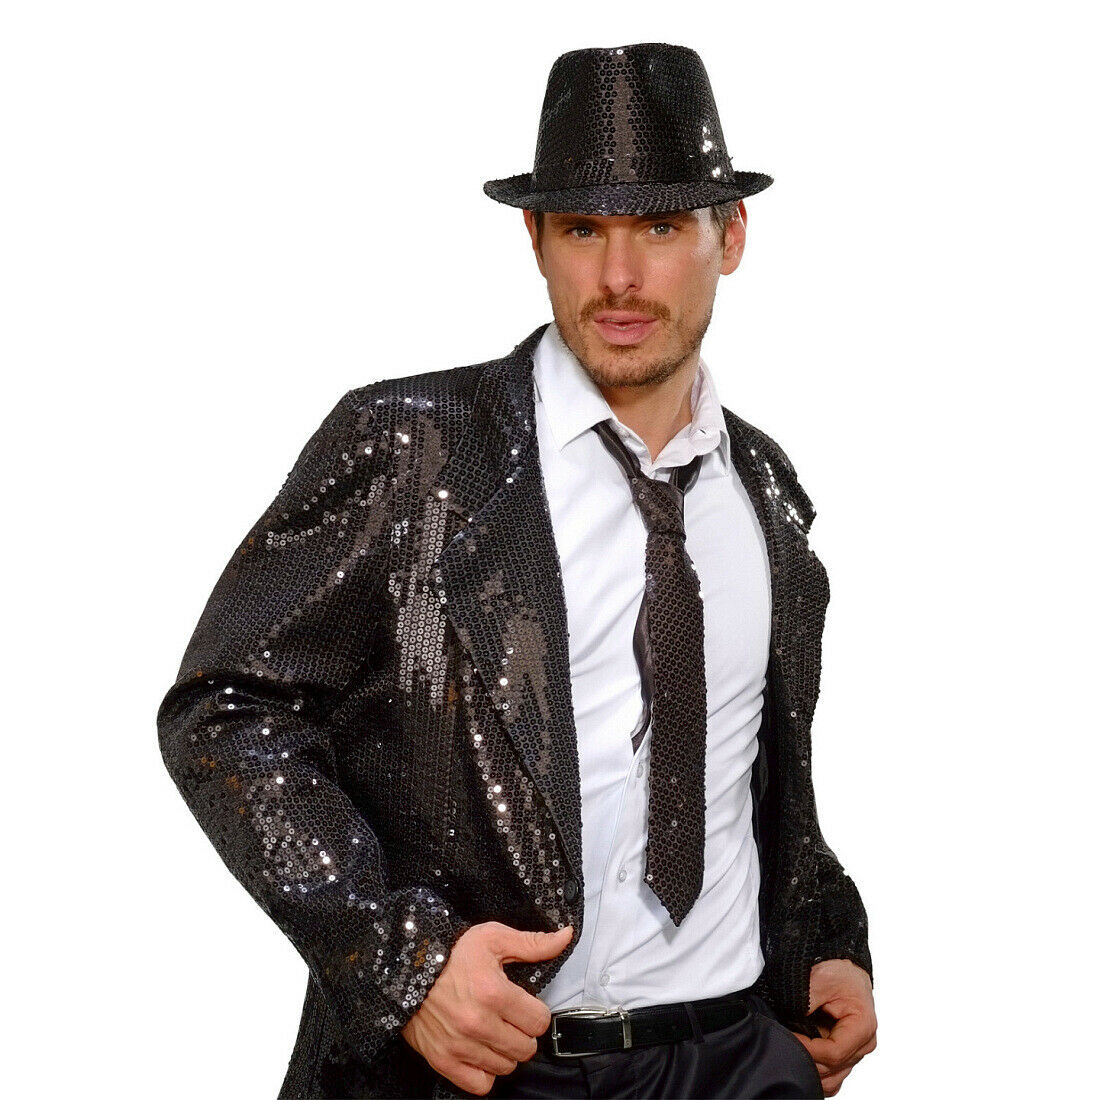 Brillantes lentejuelas-corbata unisex lentejuelas-corbata brillo-corbata negra